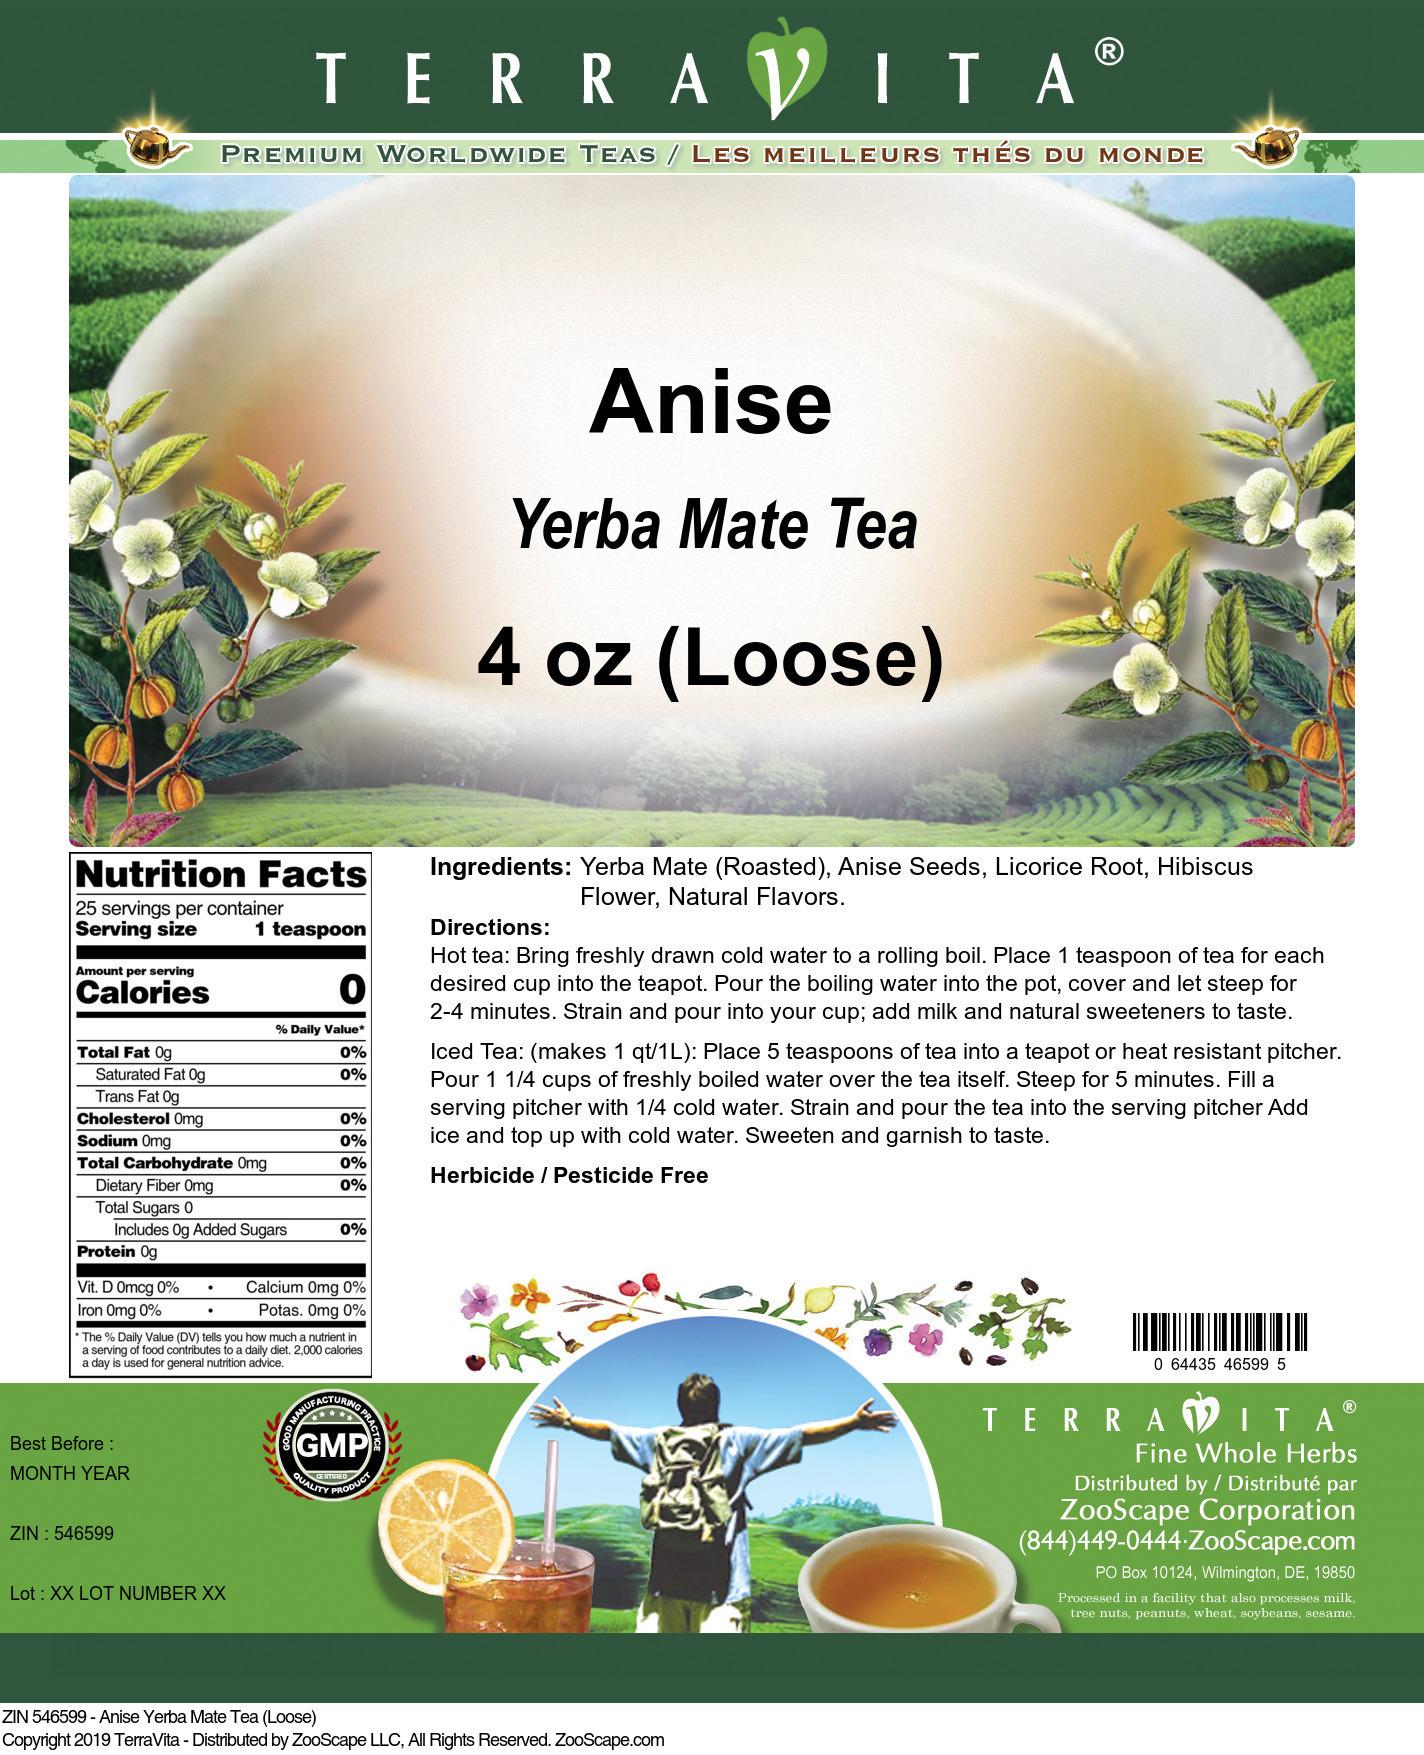 Anise Yerba Mate Tea (Loose)